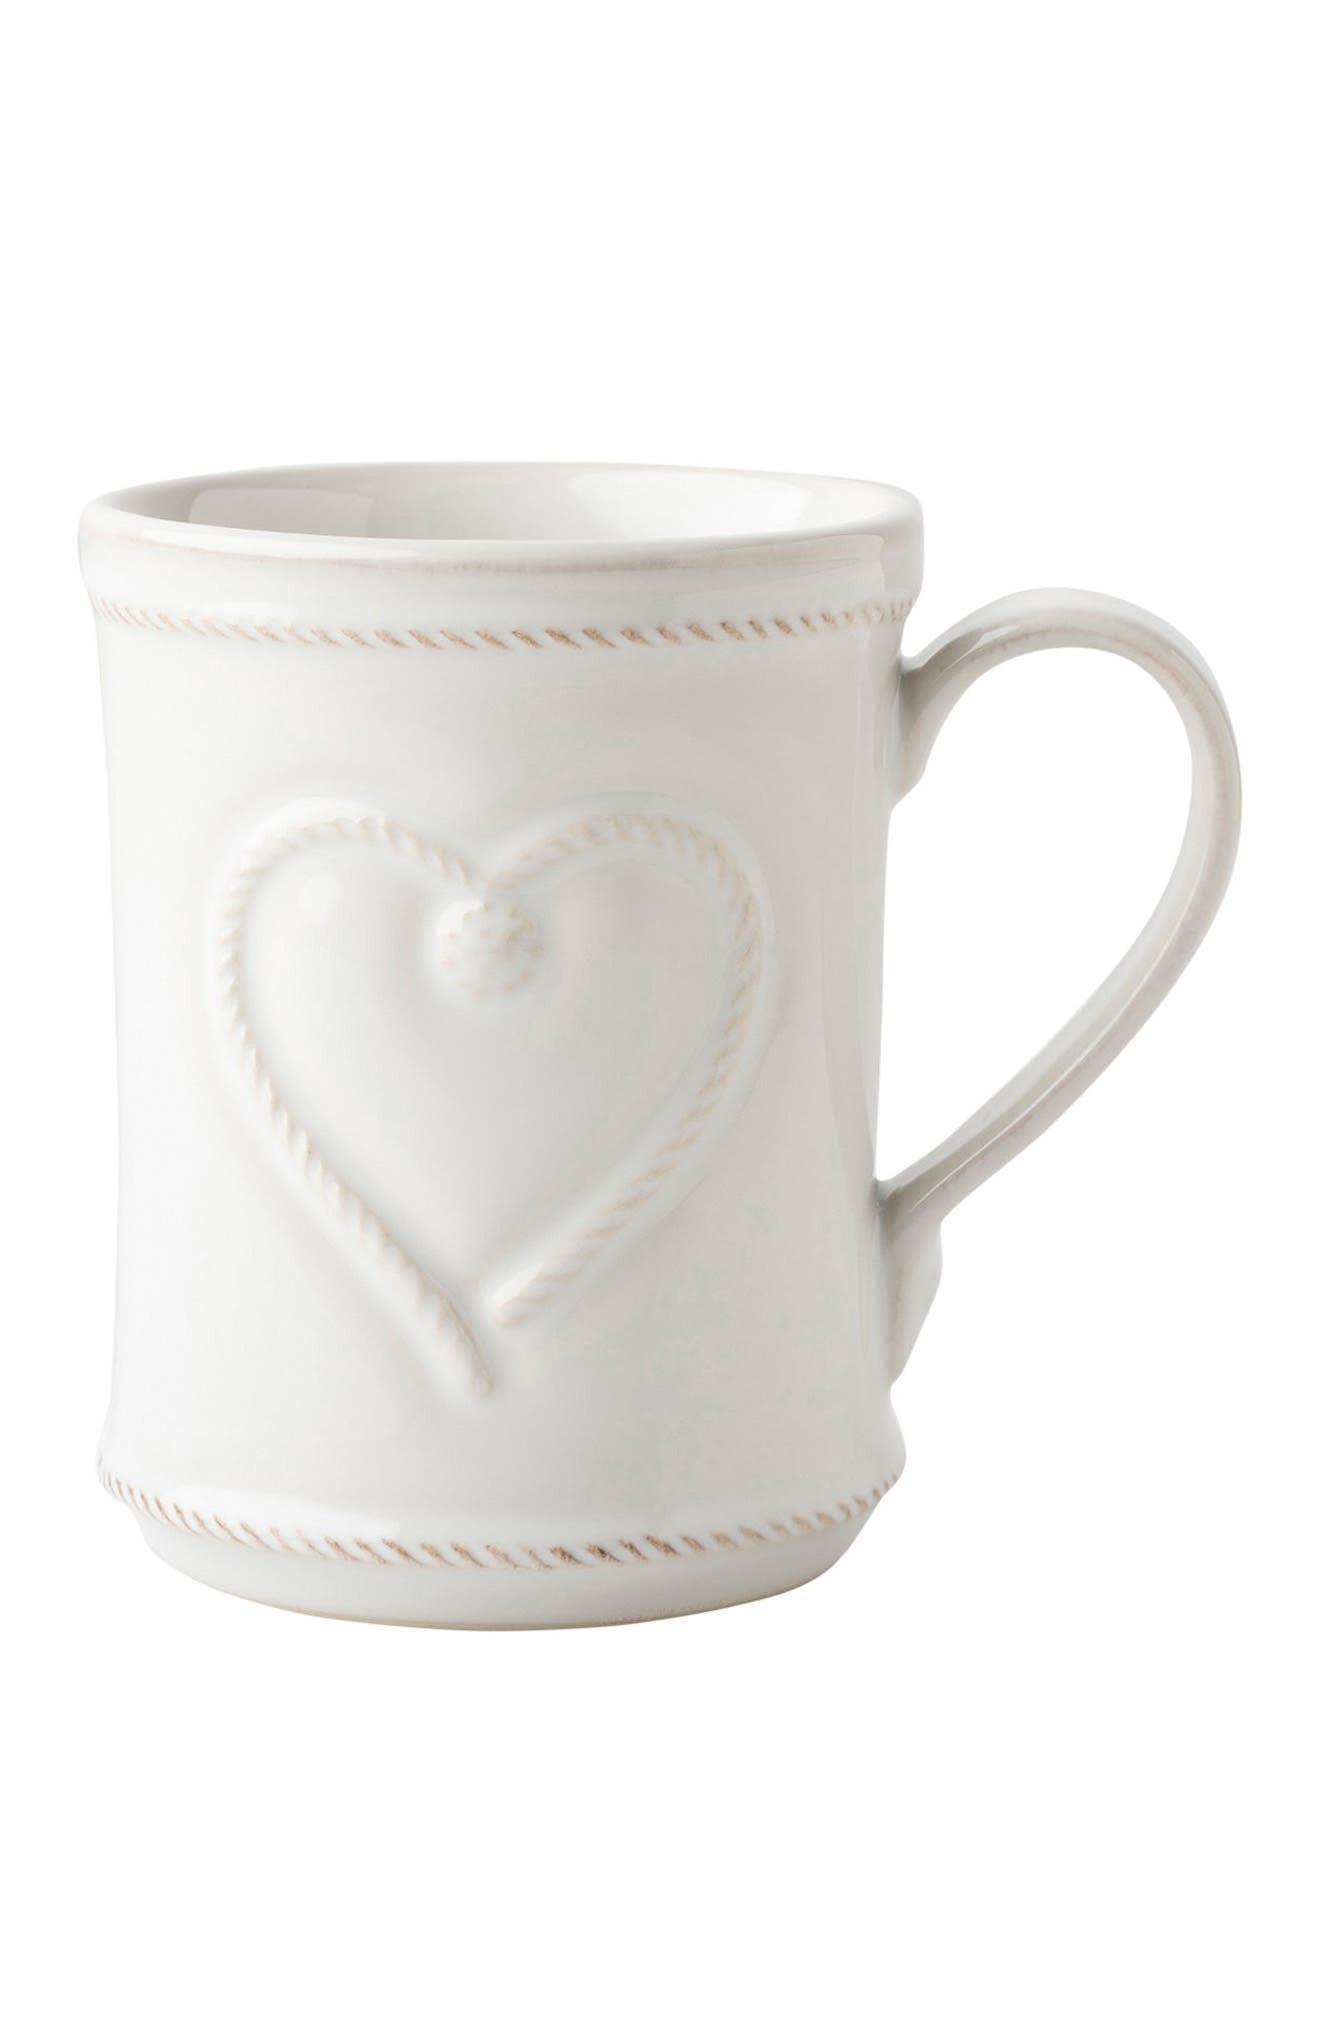 Cupfull of Love Ceramic Mug,                             Main thumbnail 1, color,                             WHITE